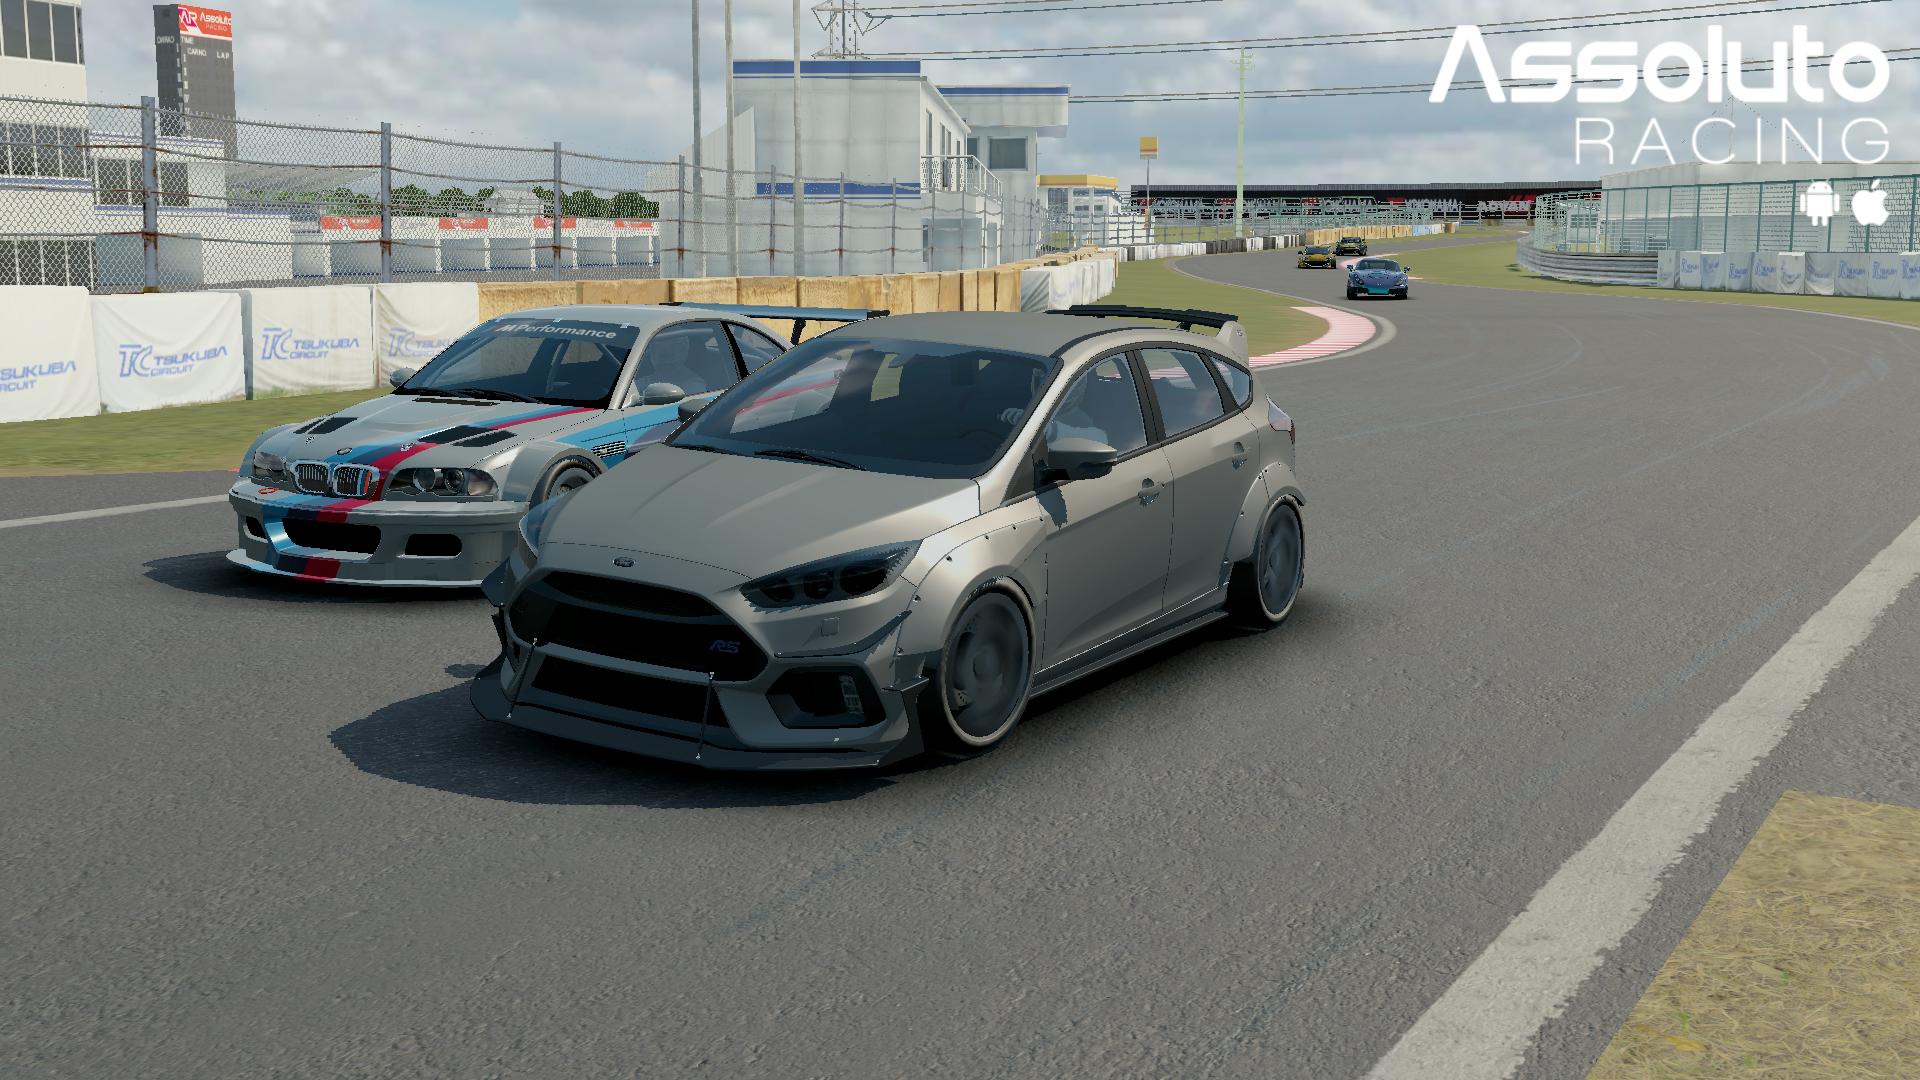 Assoluto Racing Pic